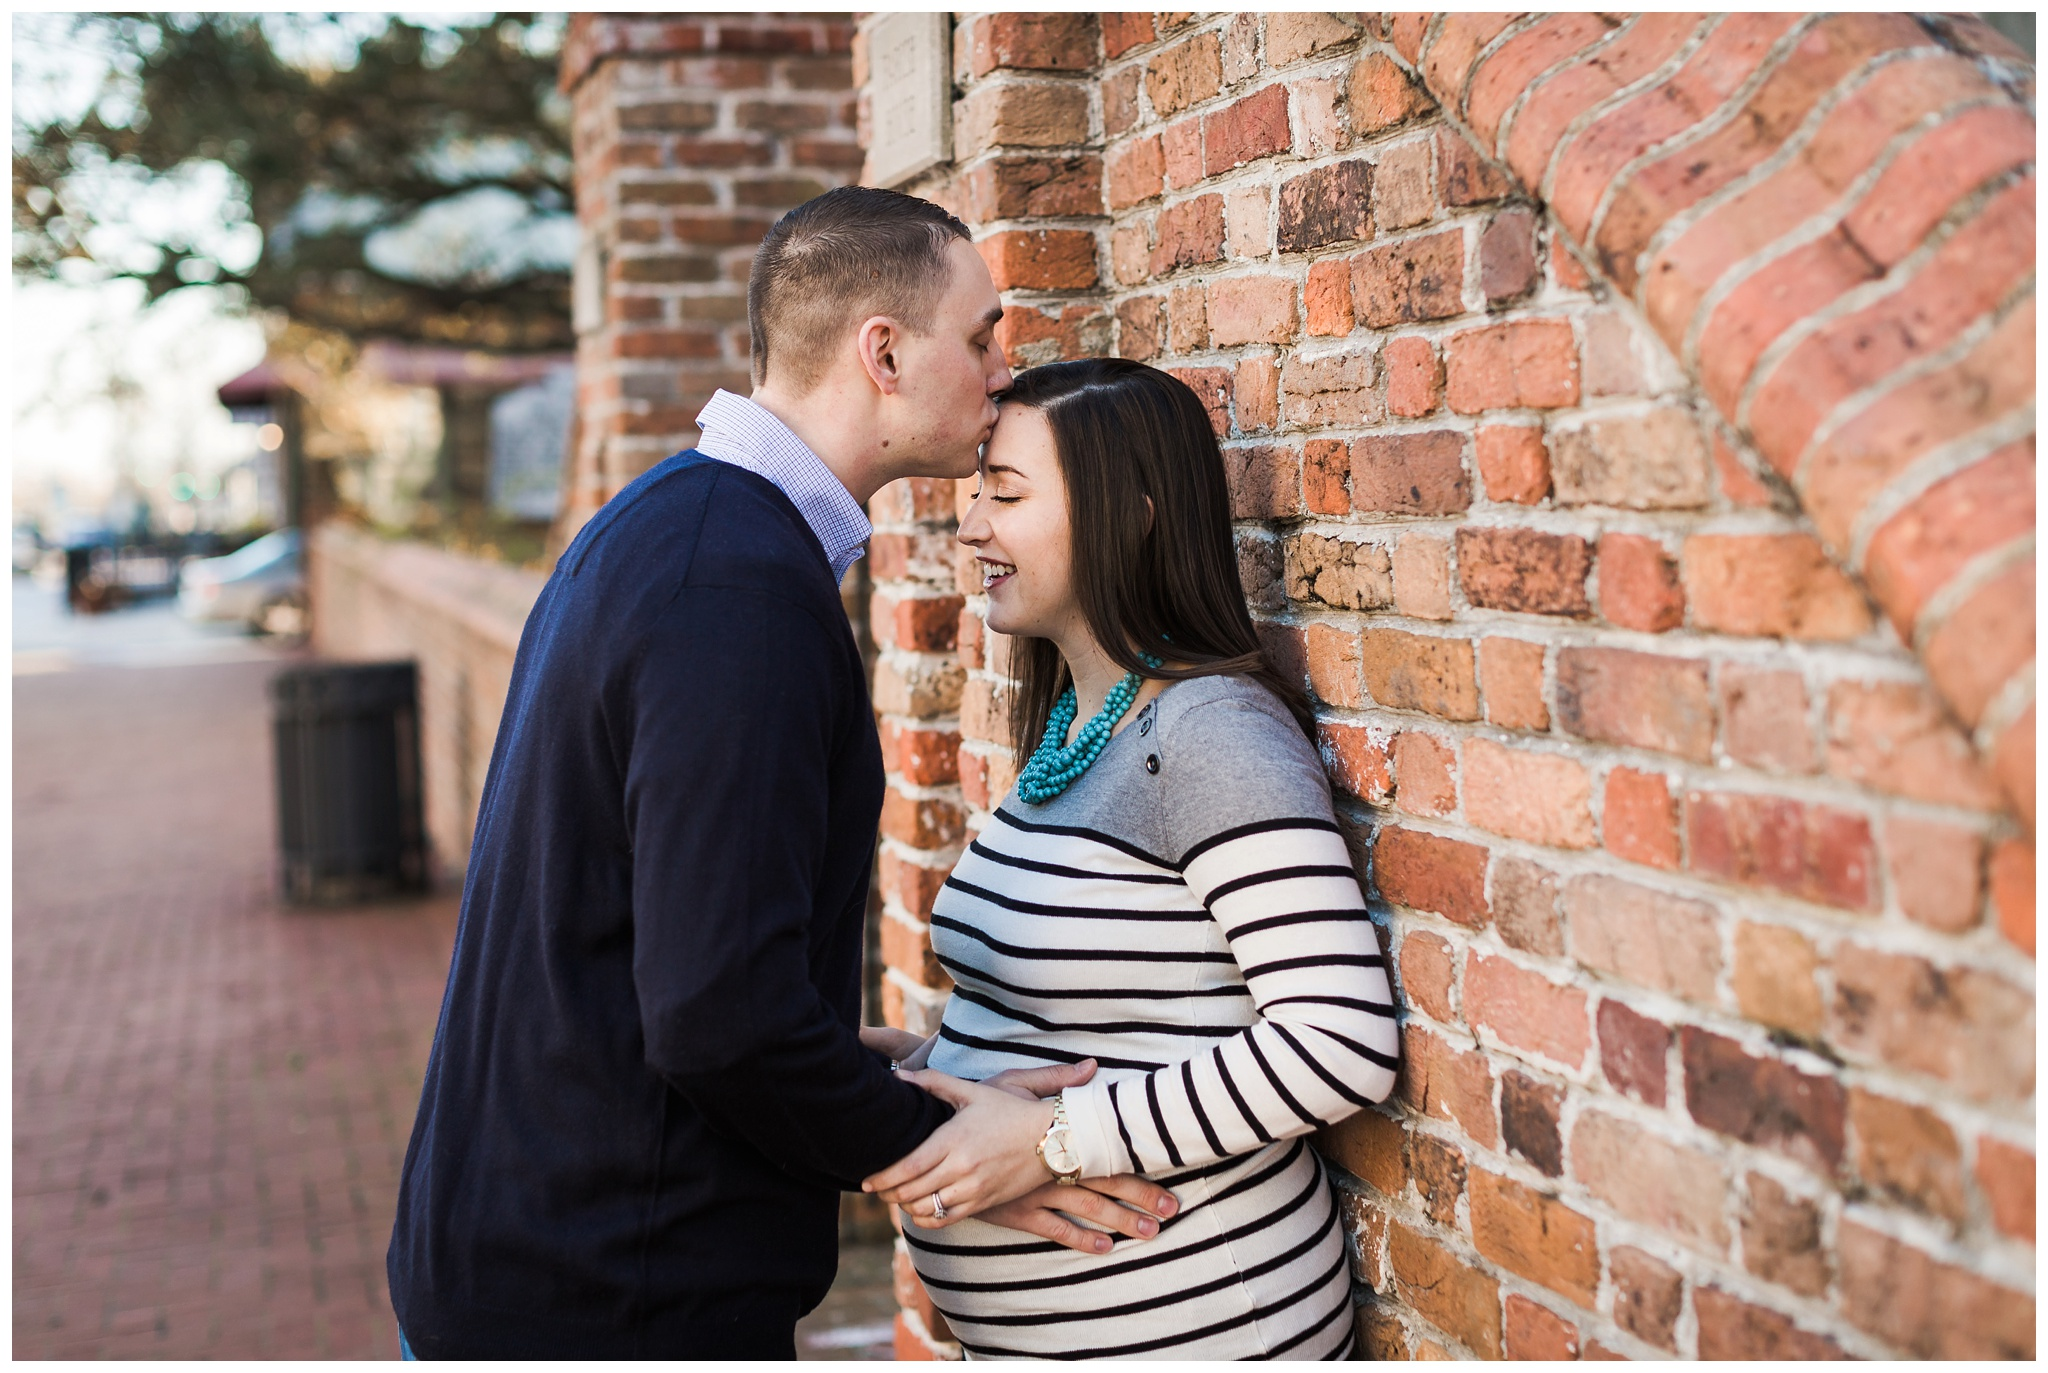 Hampton-Roads-maternity-photographer-6.jpg